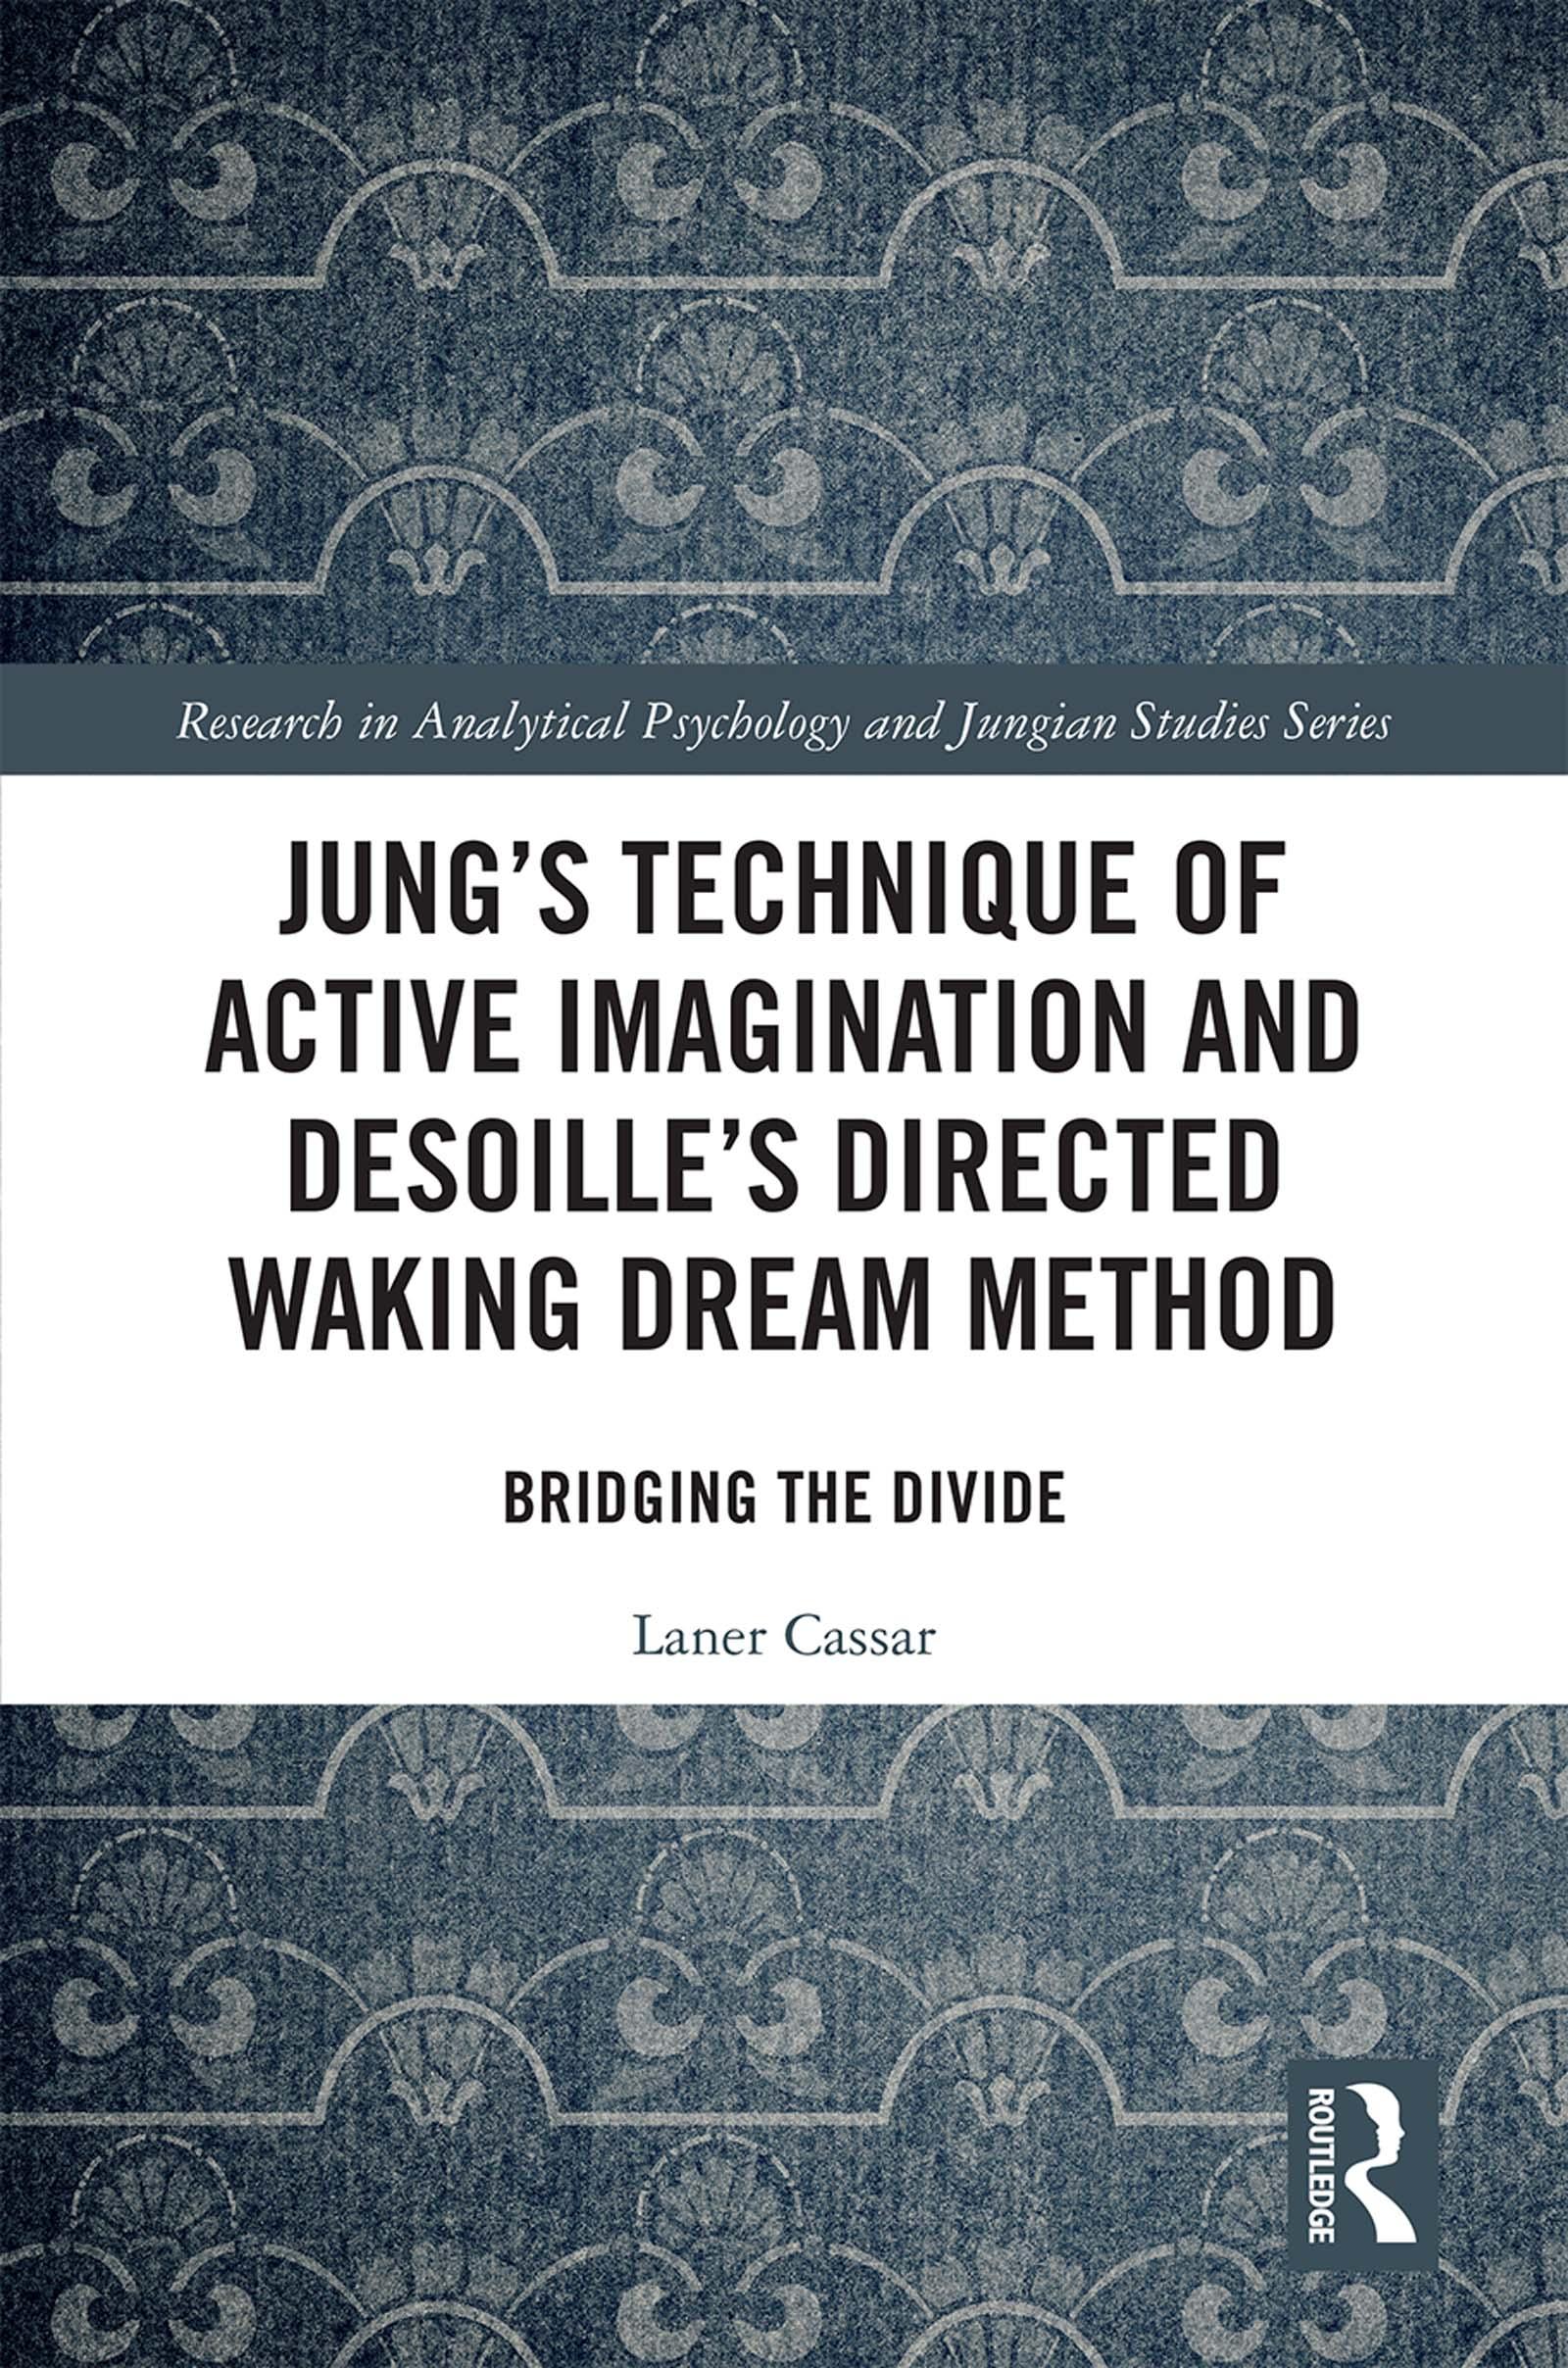 Post-Desoillian developments on the directed waking dream method